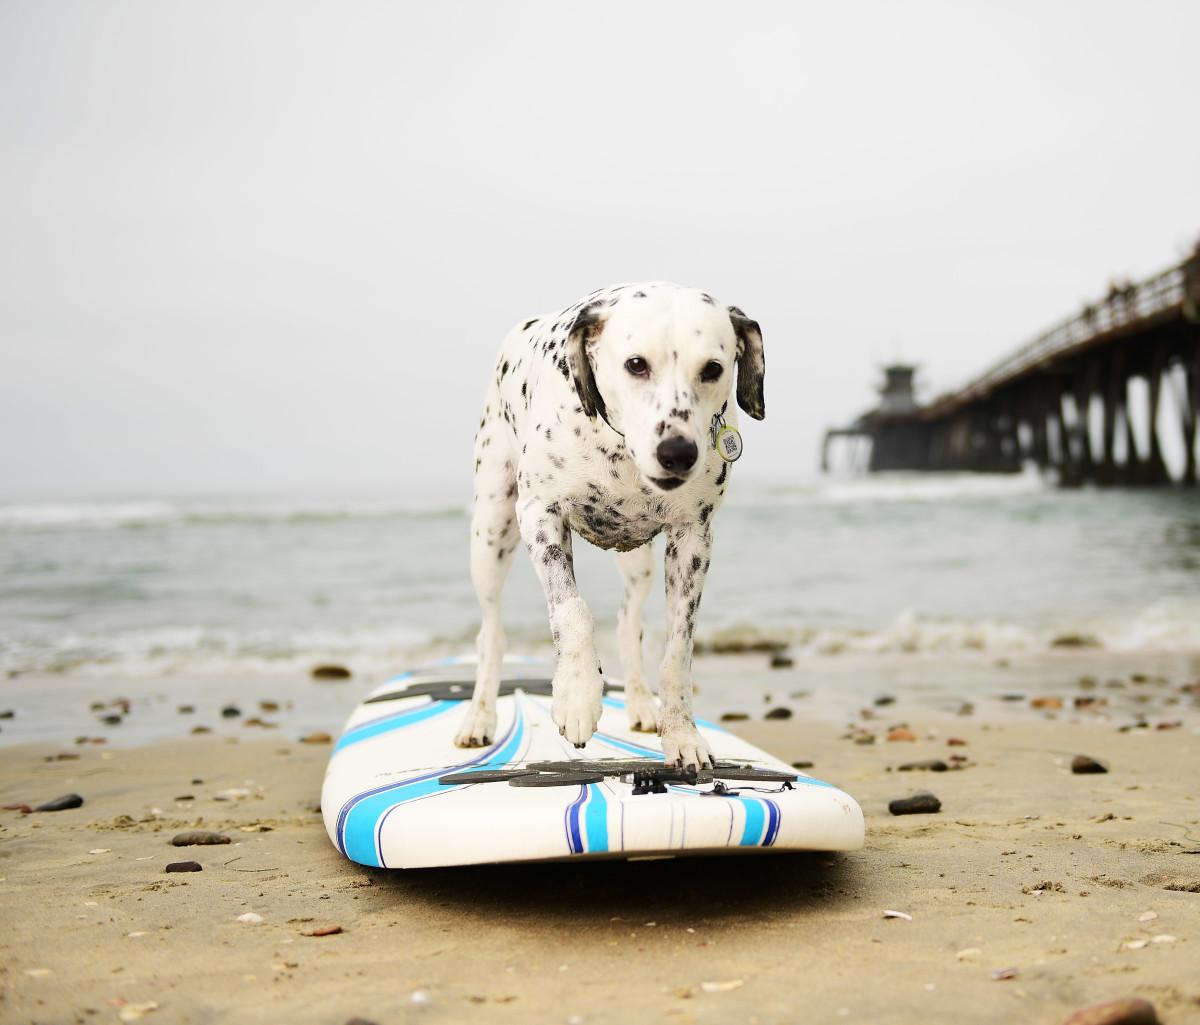 Surfing_Dog_Gallery_033.jpg